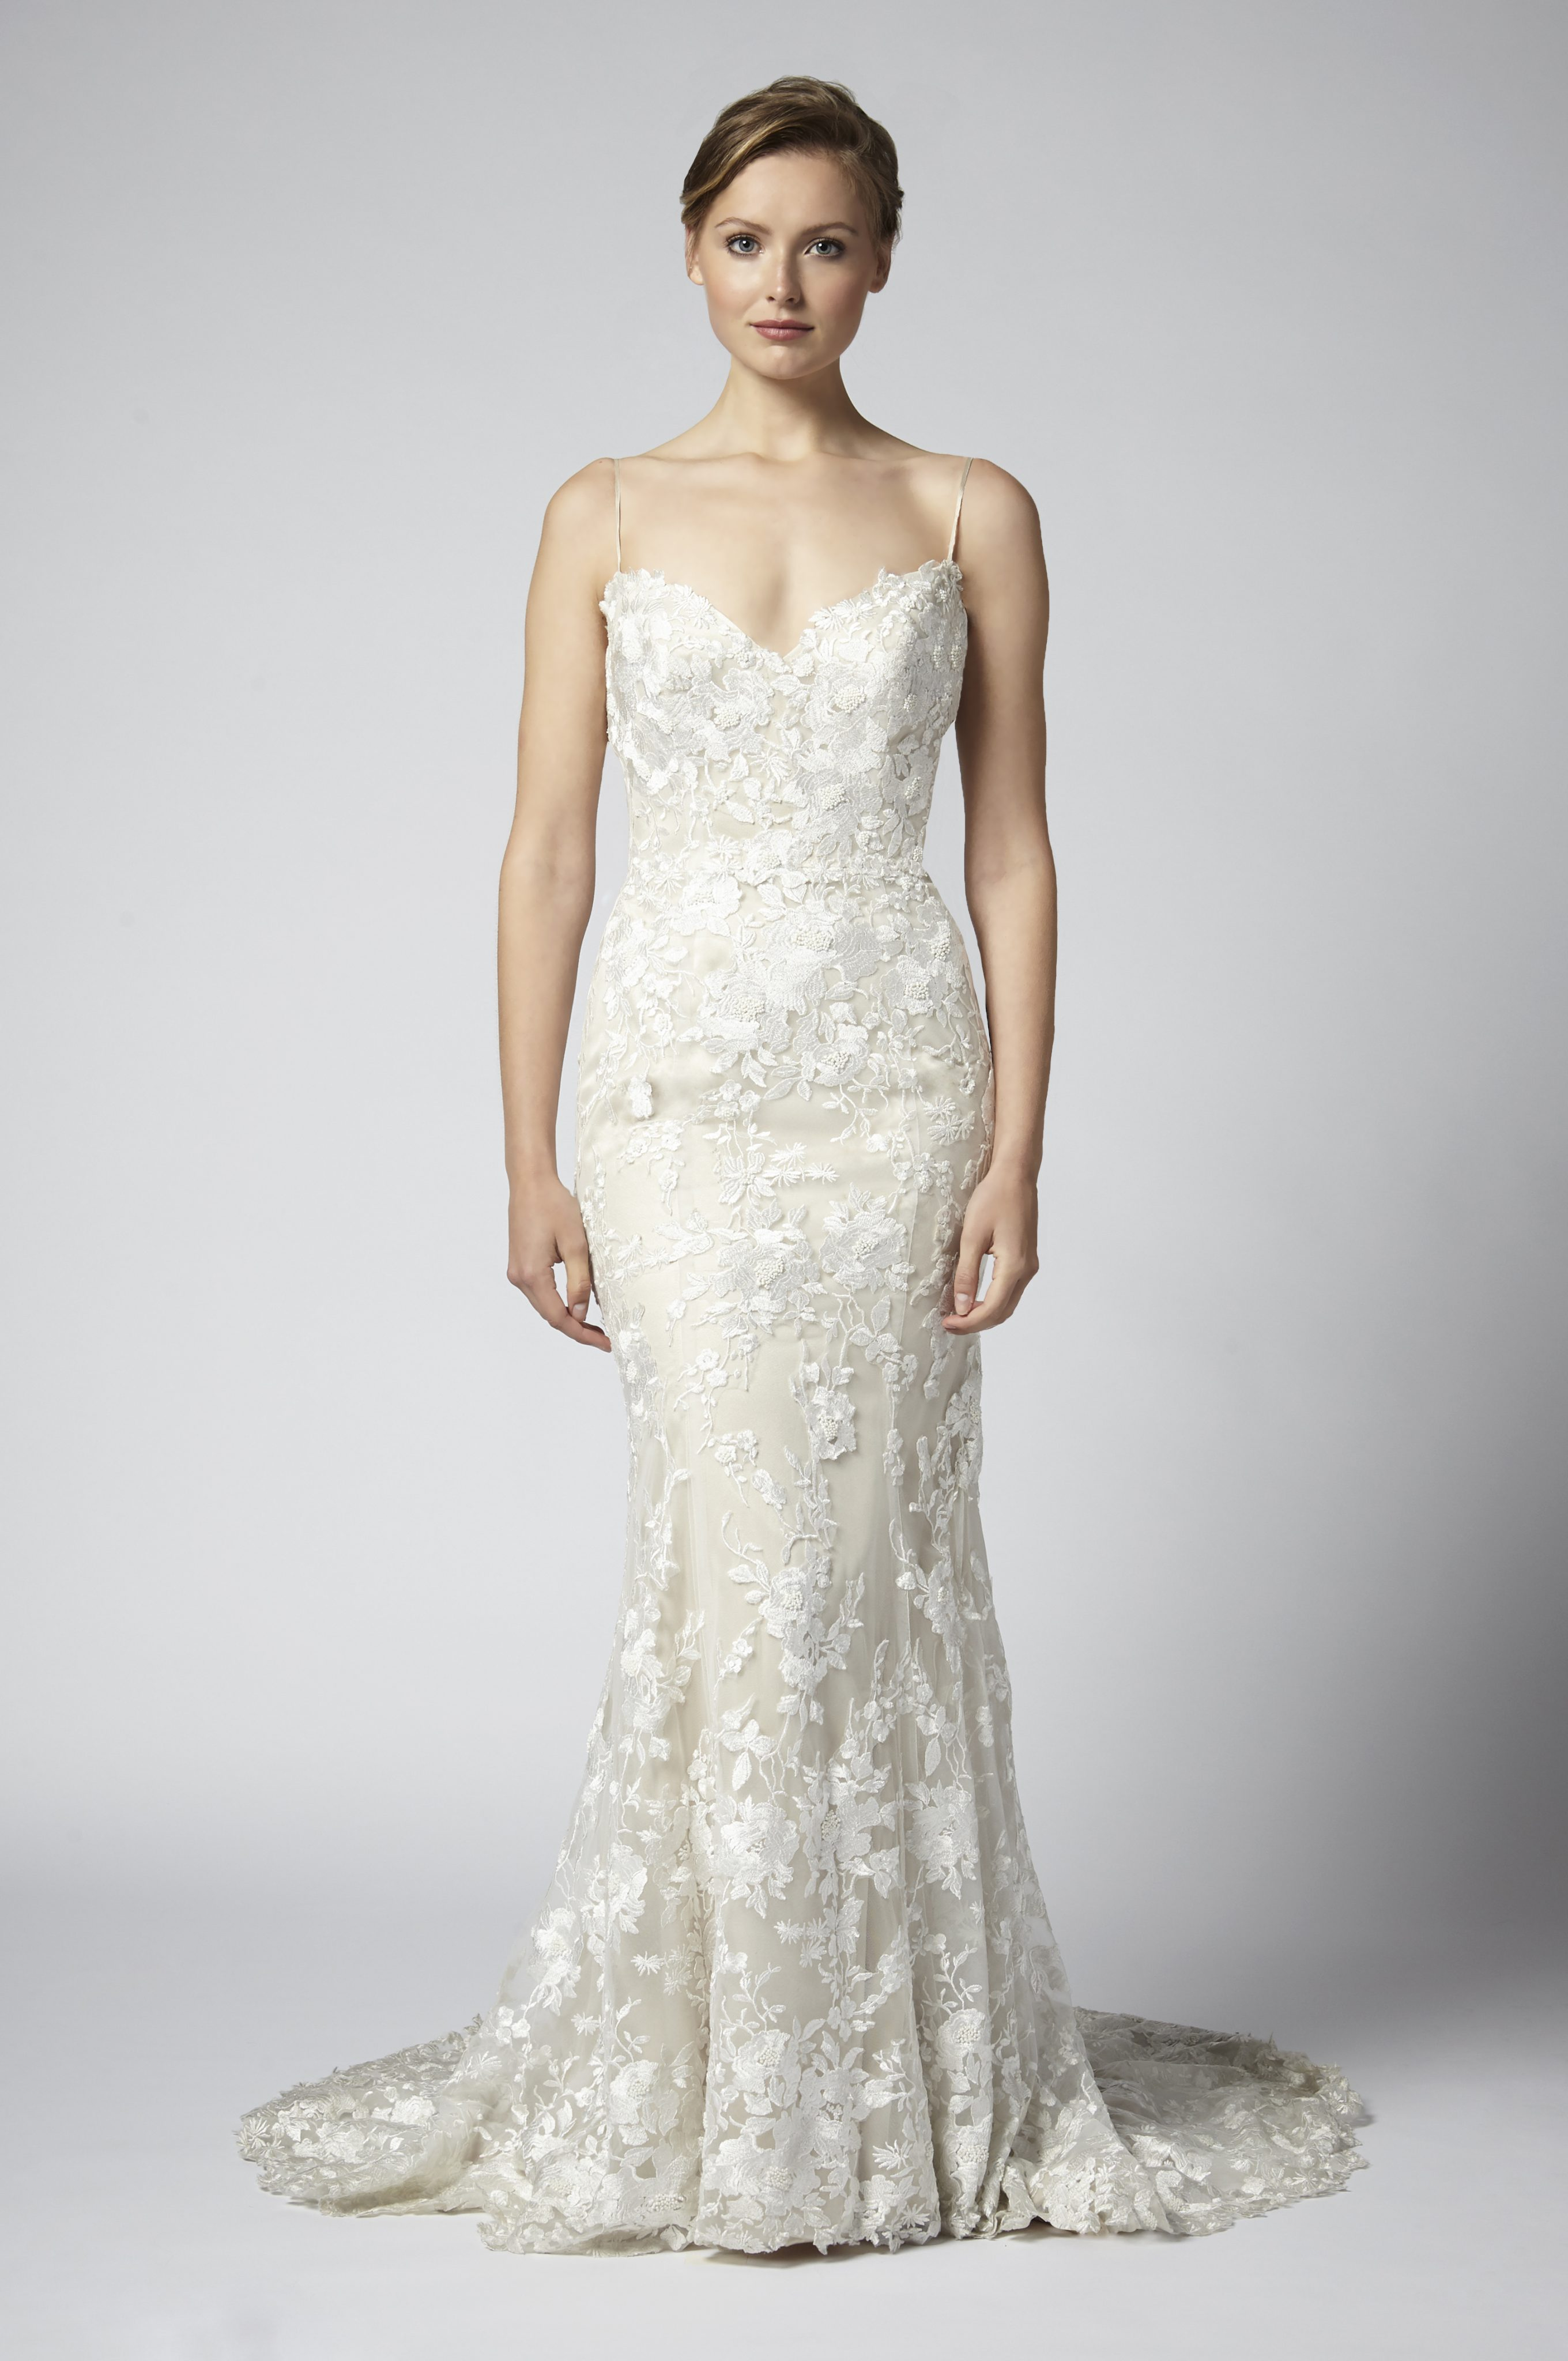 0d0deab0e32 Lace Strap Wedding Dresses - Gomes Weine AG